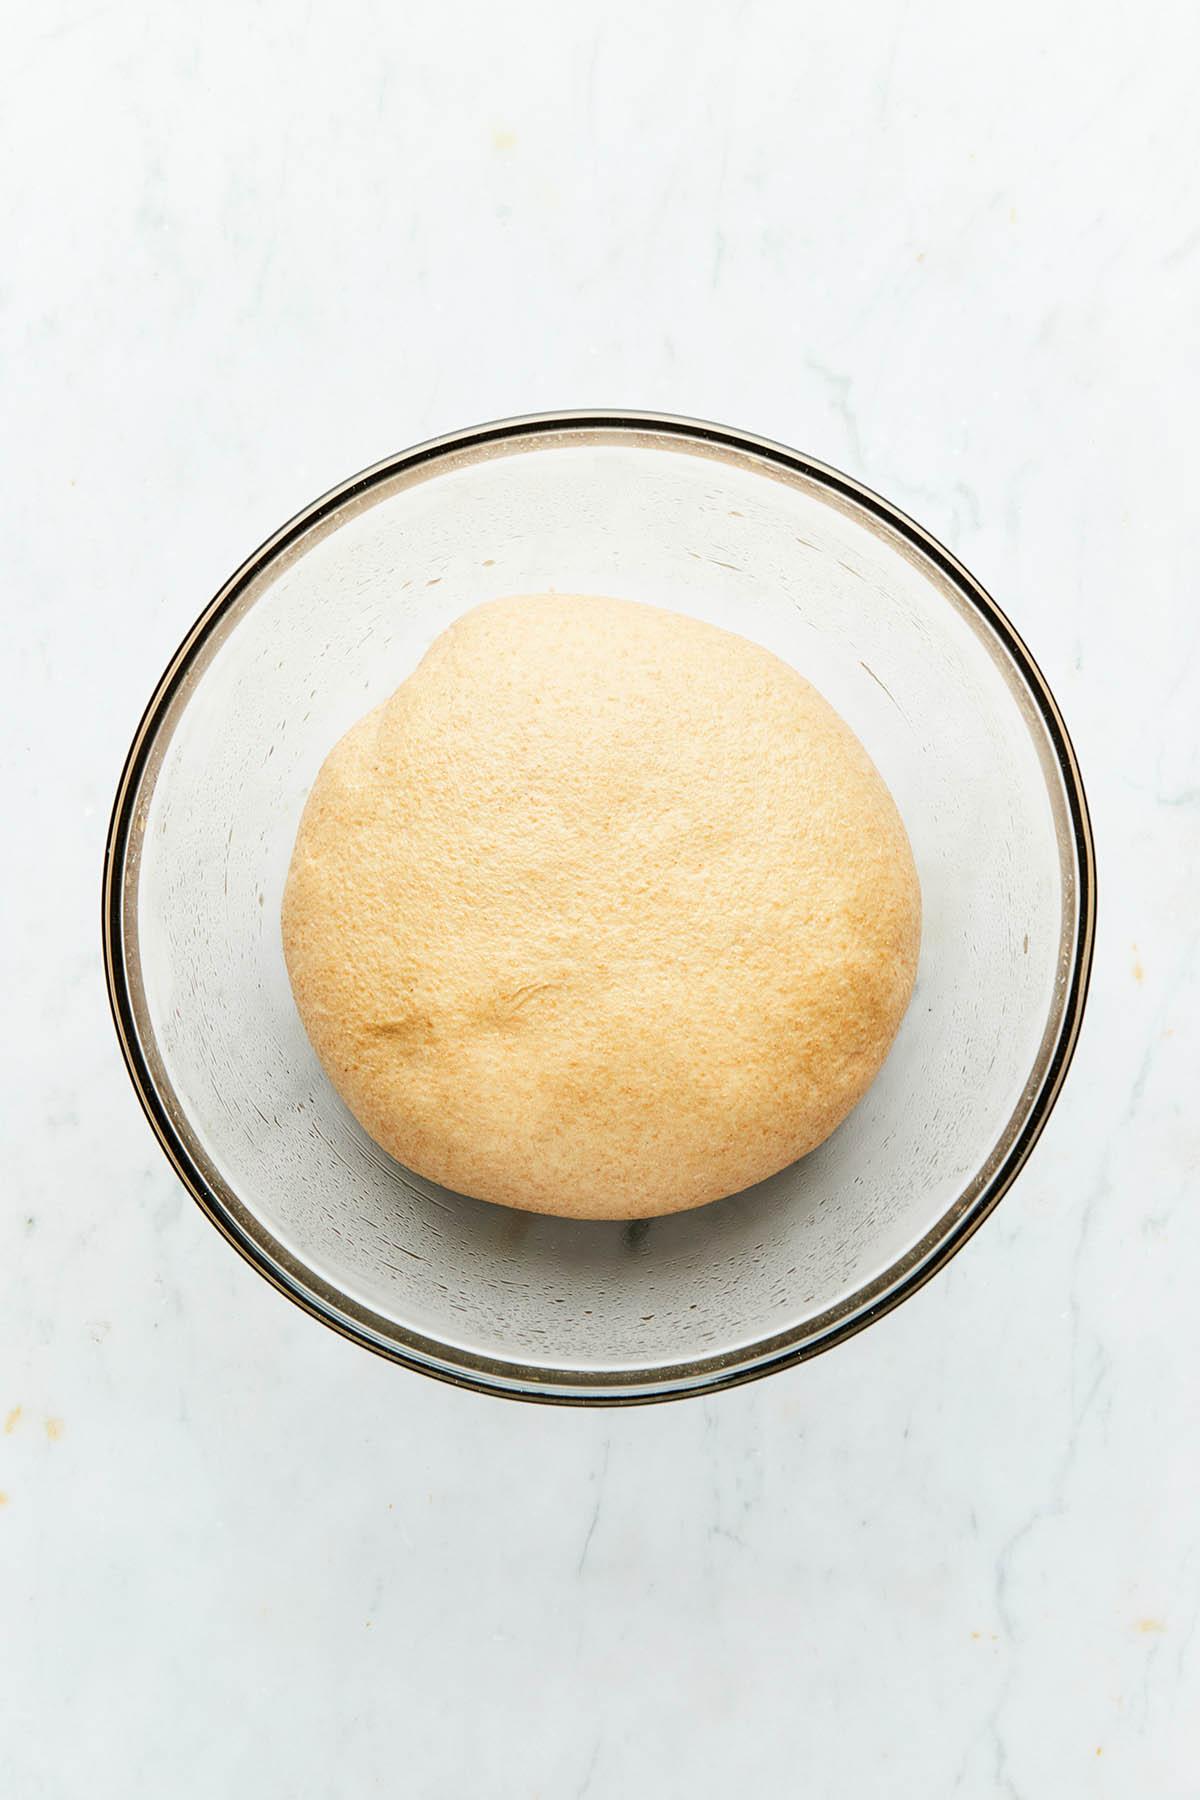 Risen pizza dough in a glass bowl.